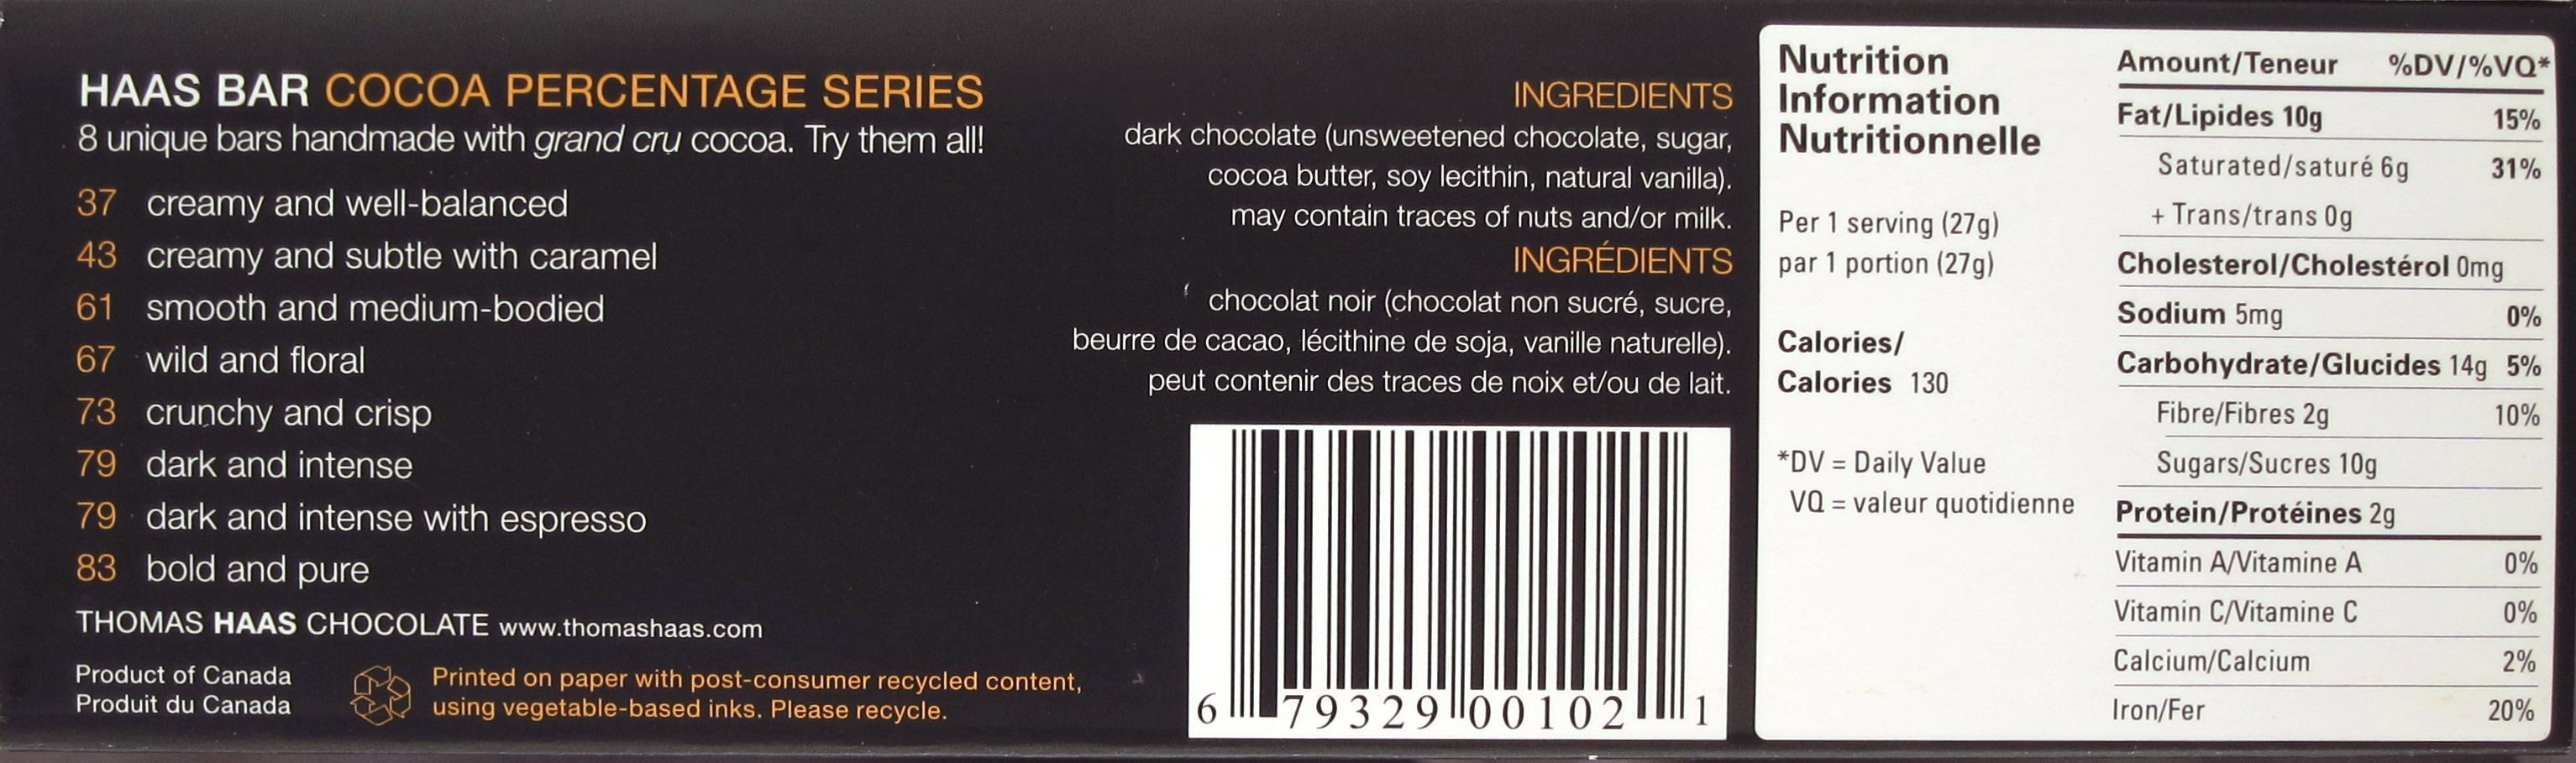 Thomas Haas Criollo-Schokolade 61% - Inhaltsangaben